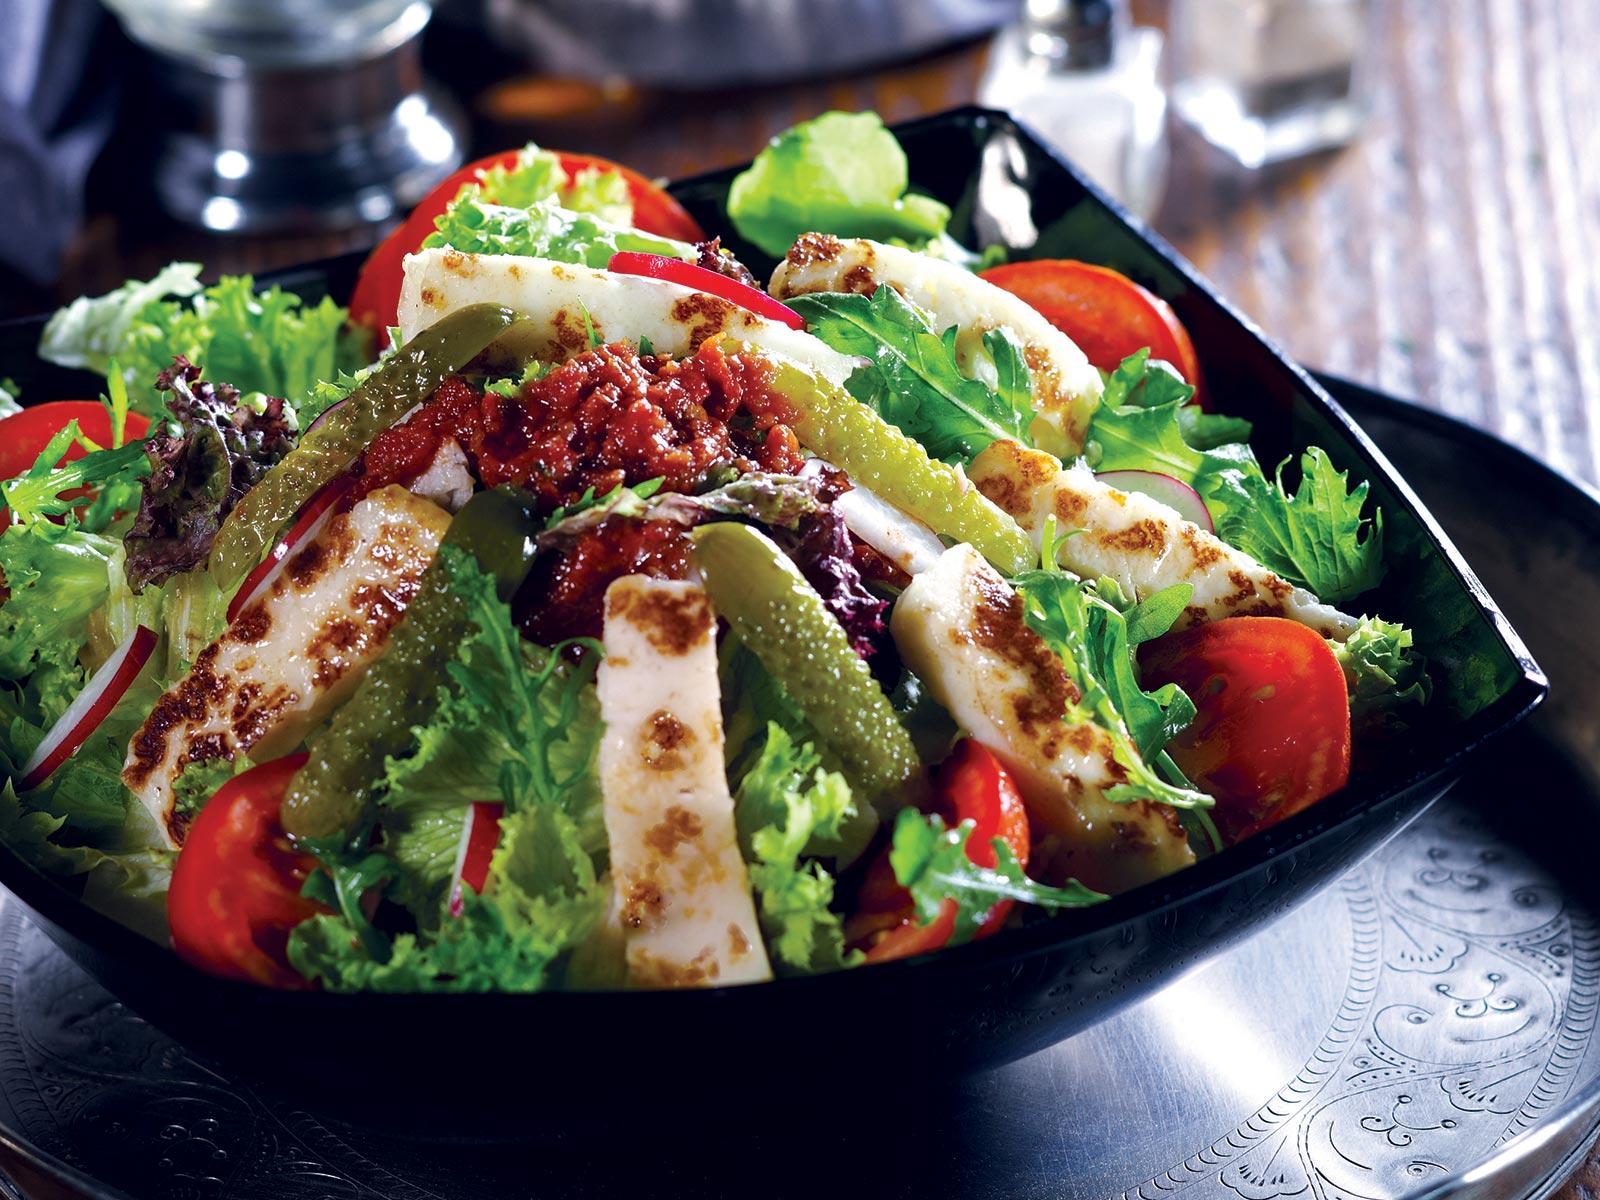 Souvlaki kebap menu in athens greece greek cuisine for About greek cuisine